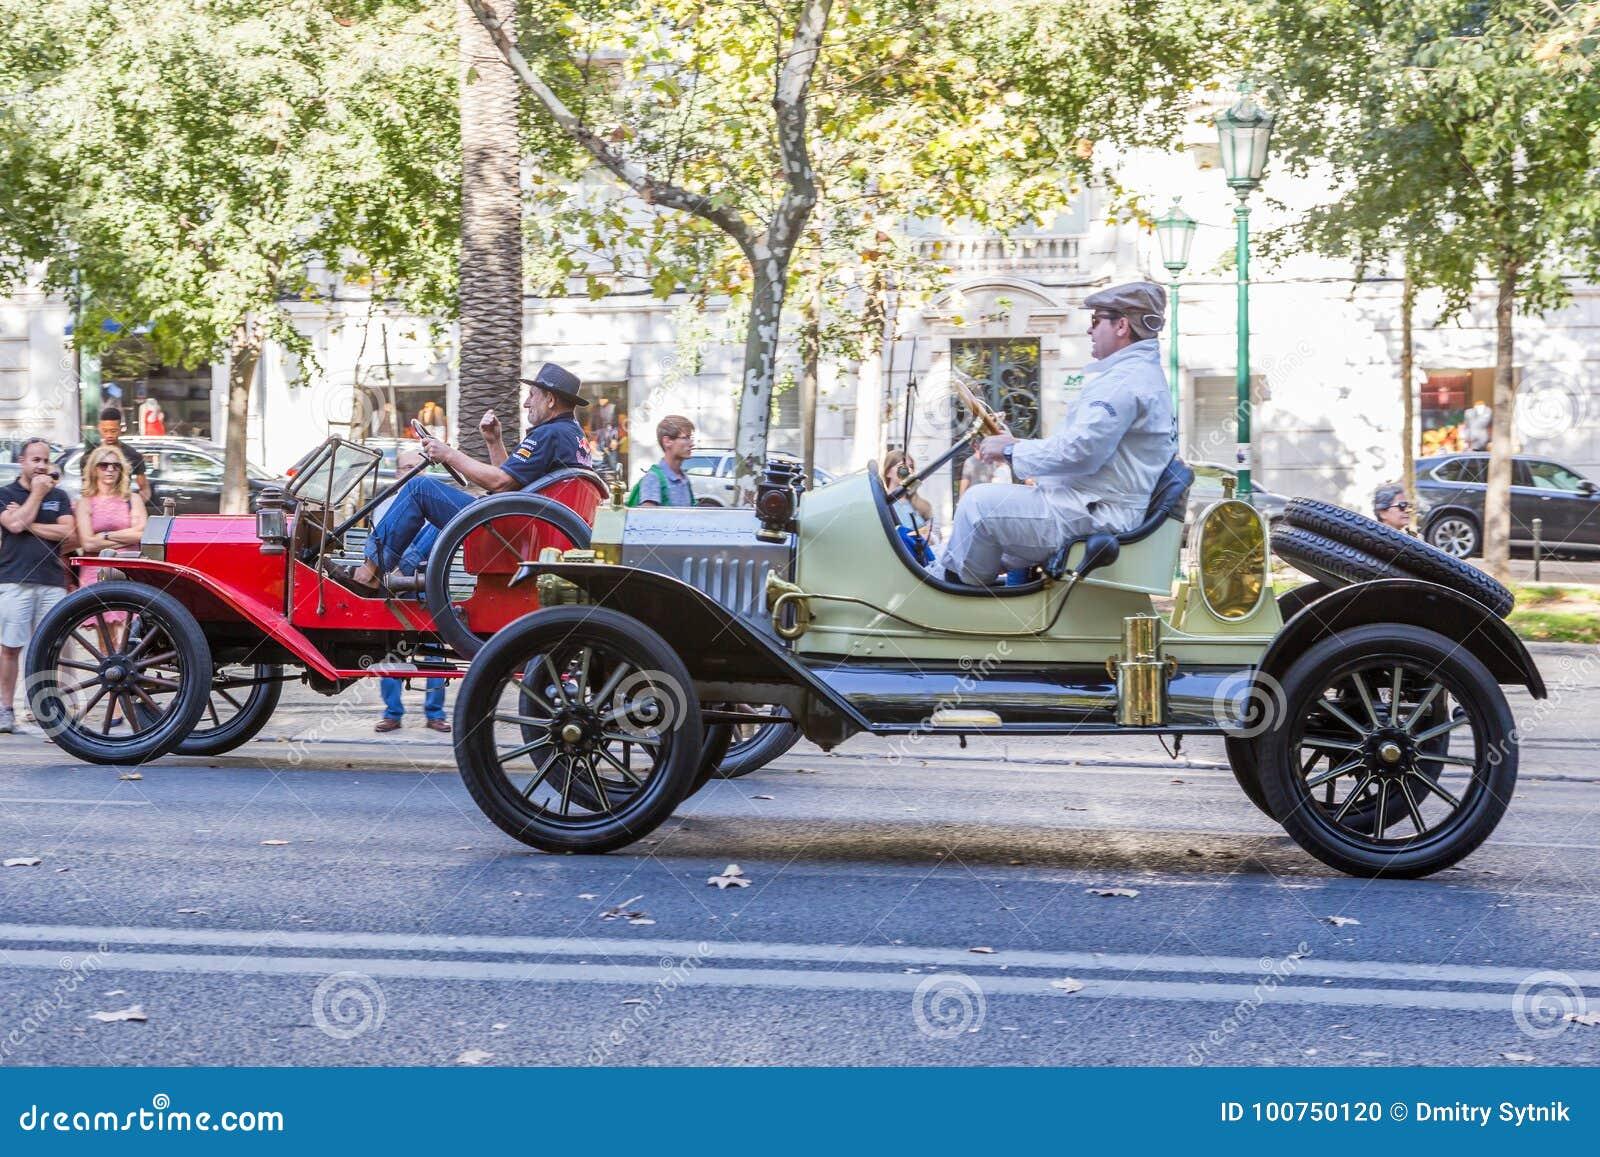 lisbon portugal september 24 2017 reto car show on street o editorial image image of club. Black Bedroom Furniture Sets. Home Design Ideas